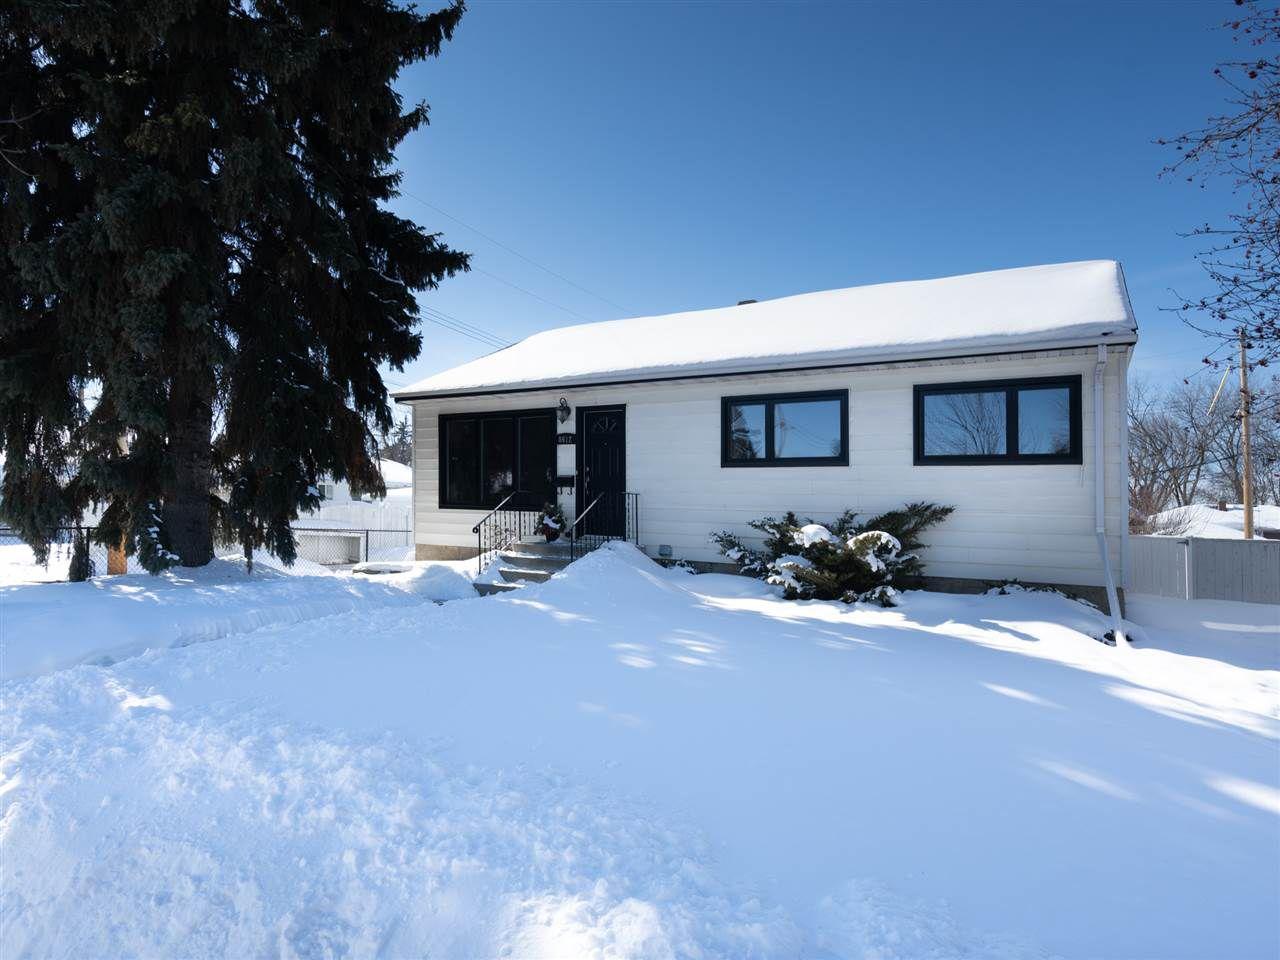 Main Photo: 8612 79 Street in Edmonton: Zone 18 House for sale : MLS®# E4147198